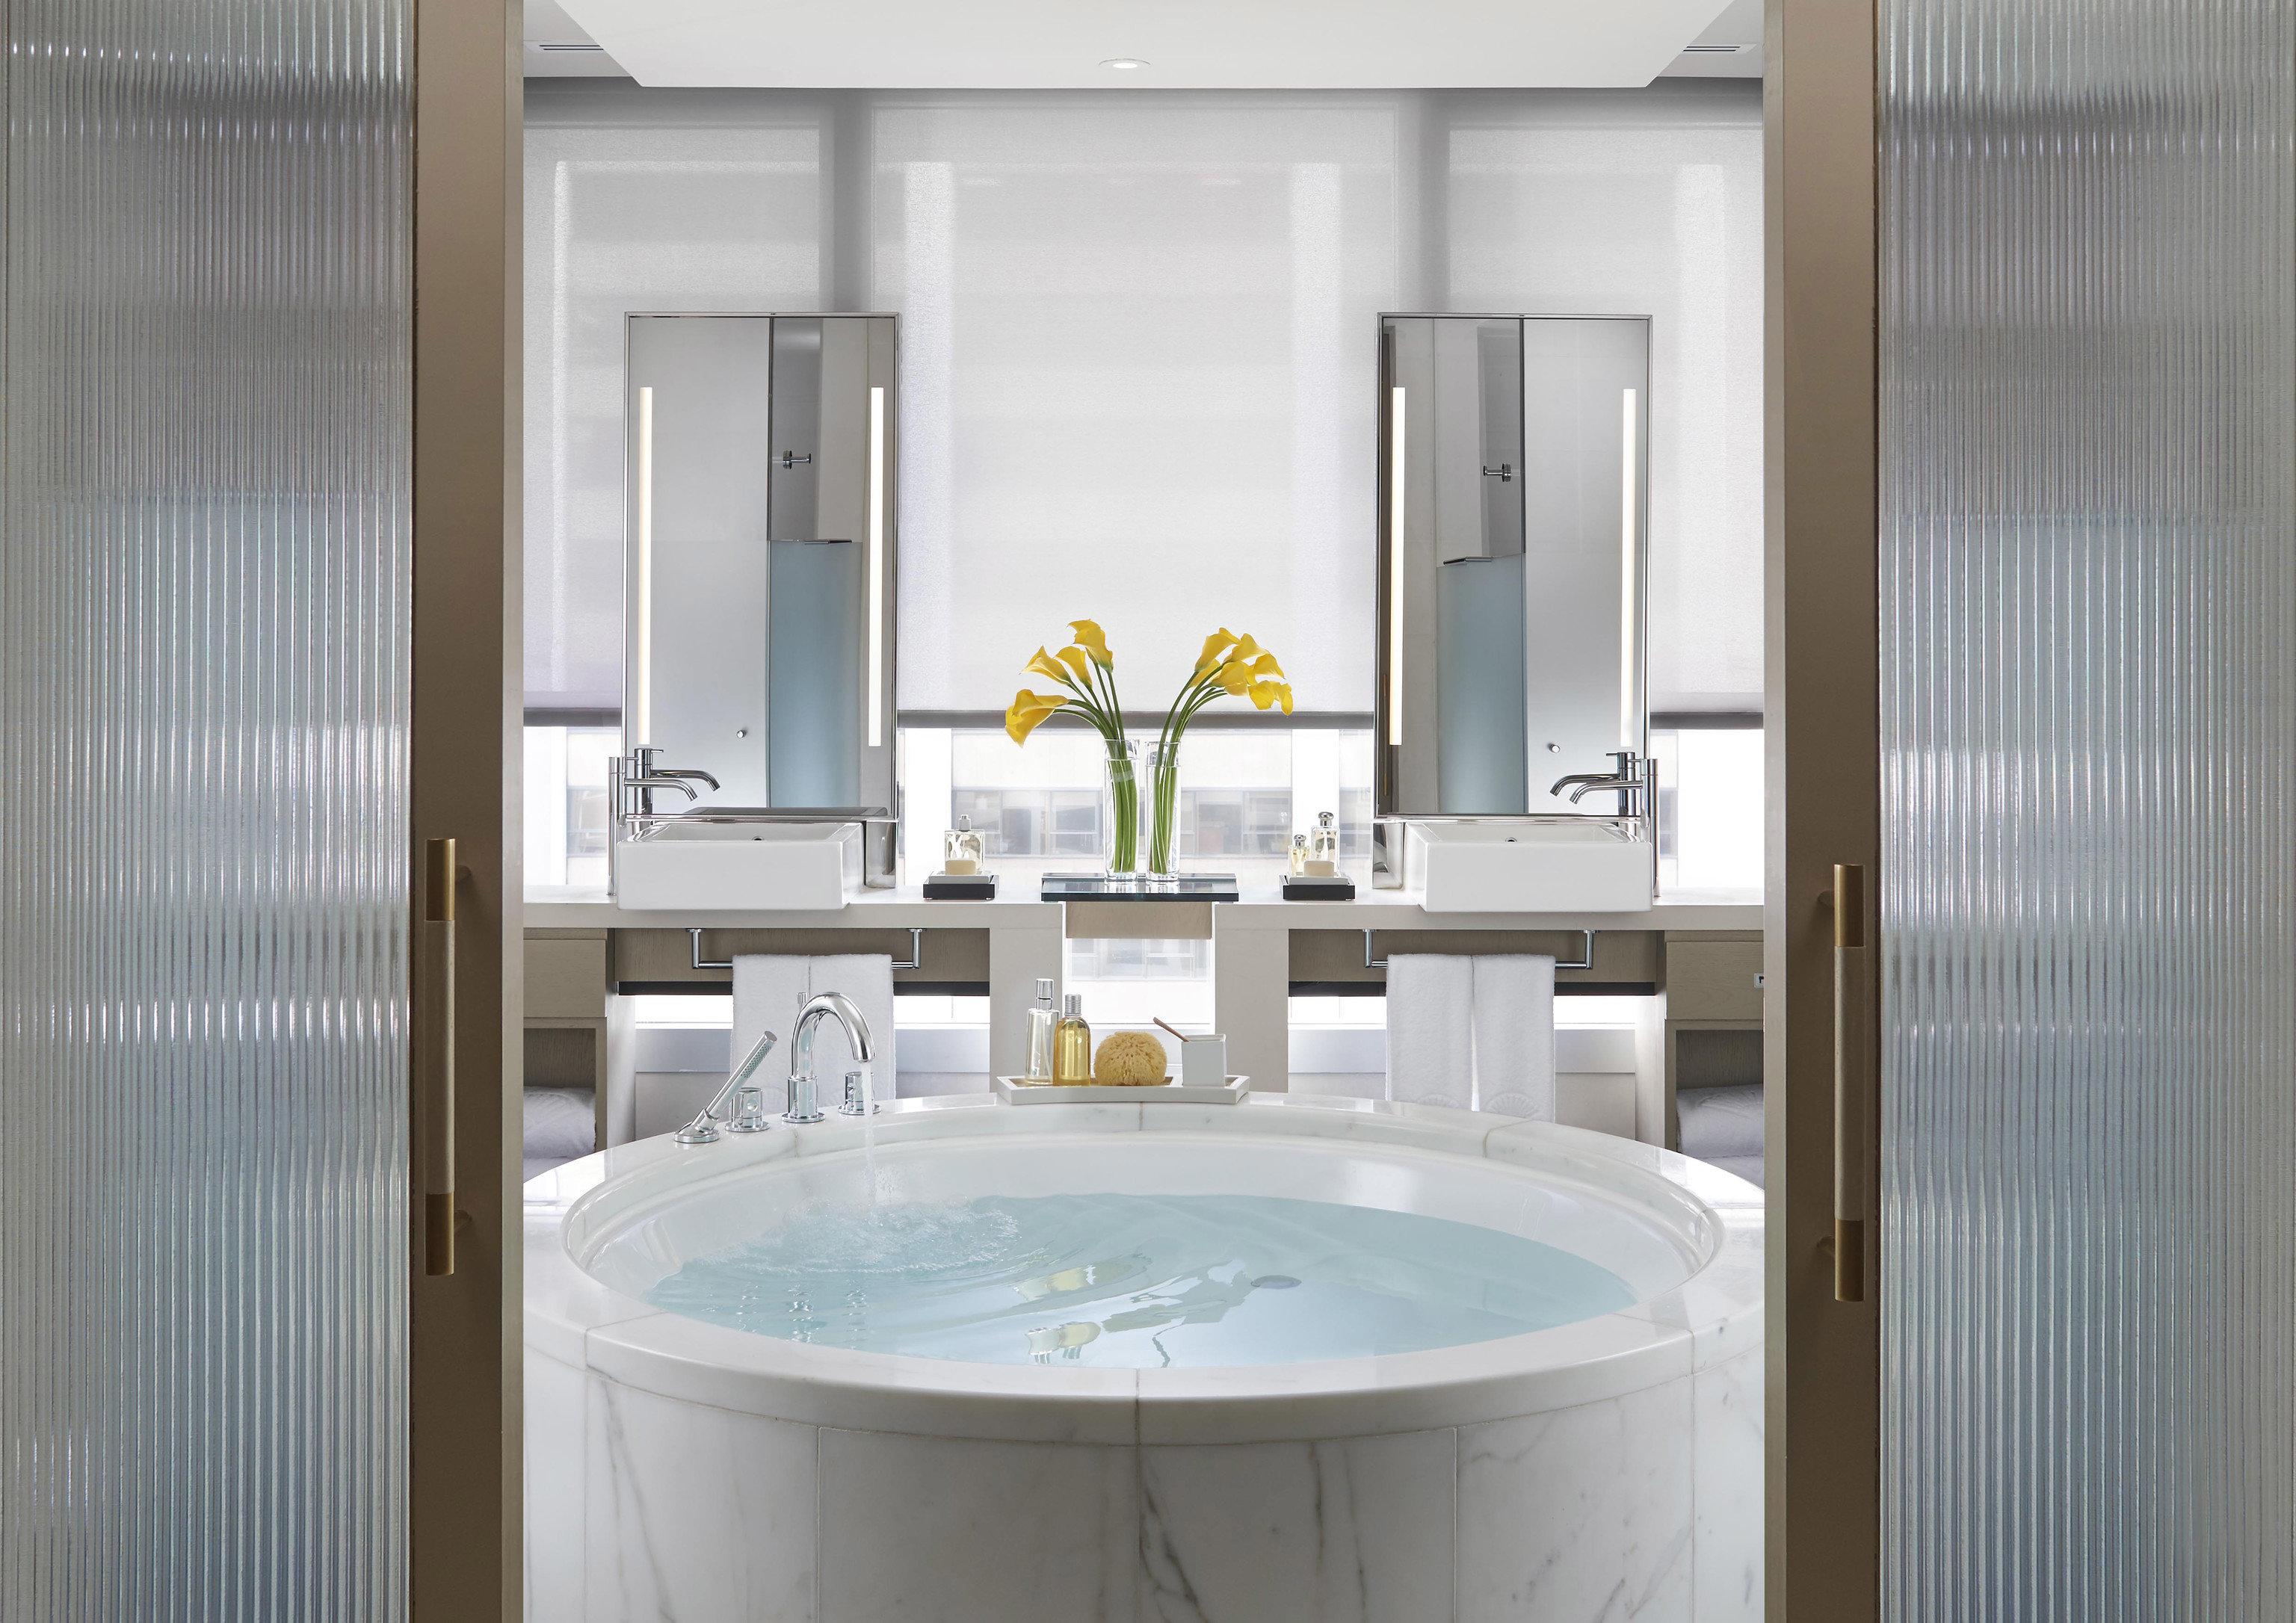 Hotels bathroom property sink bathtub shower white home swimming pool plumbing fixture Suite tub Bath